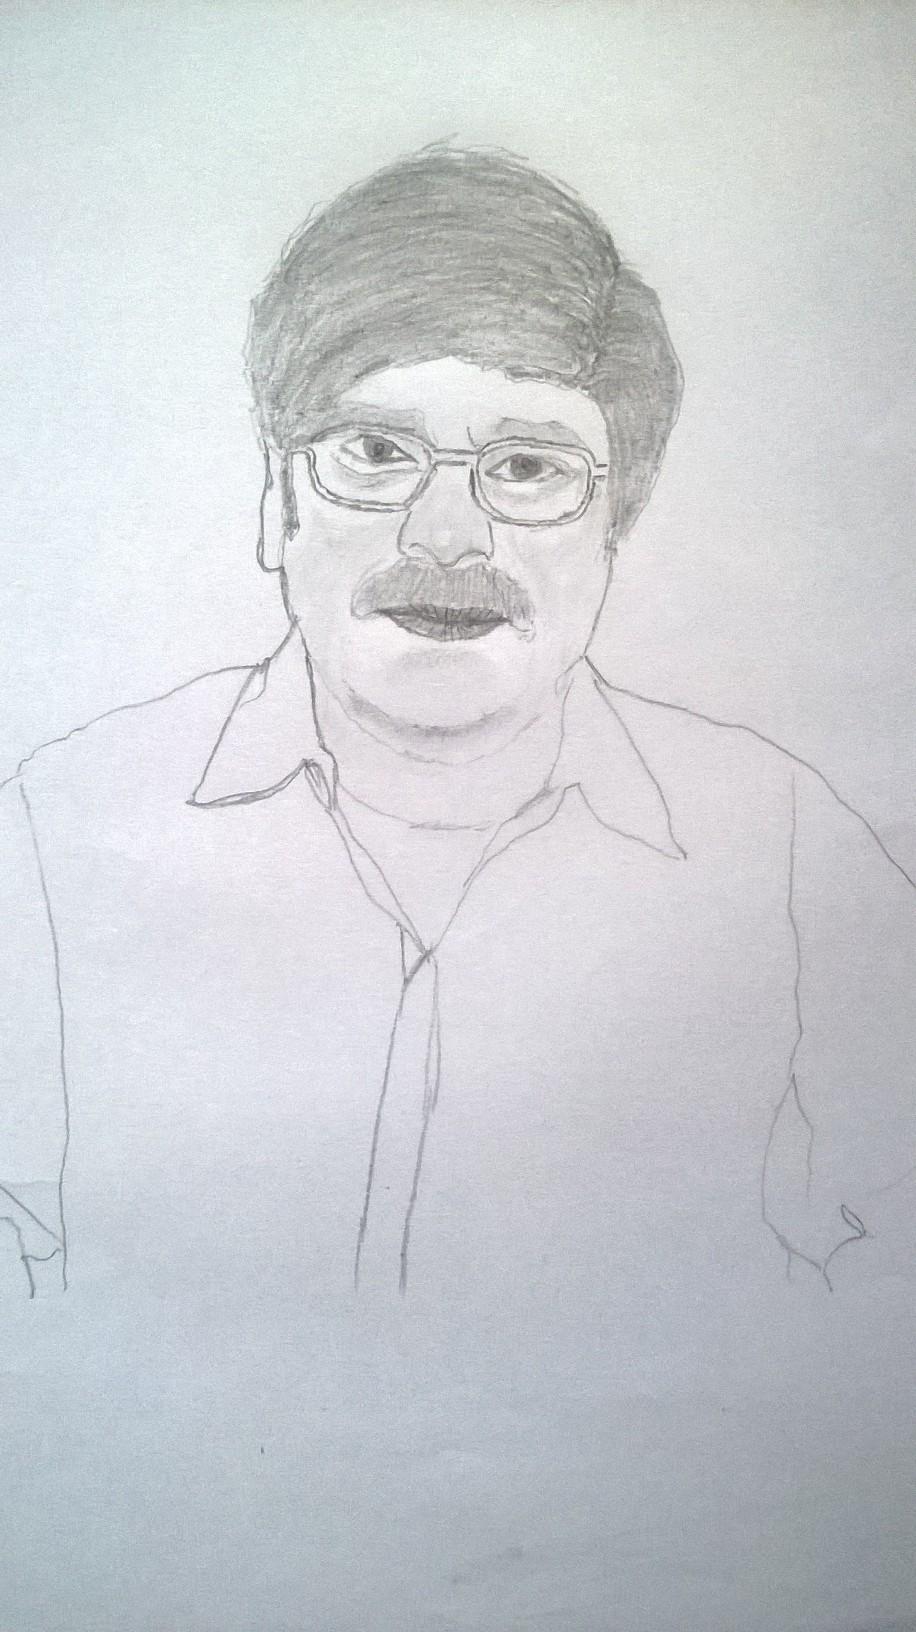 i will draw any photo with pencil